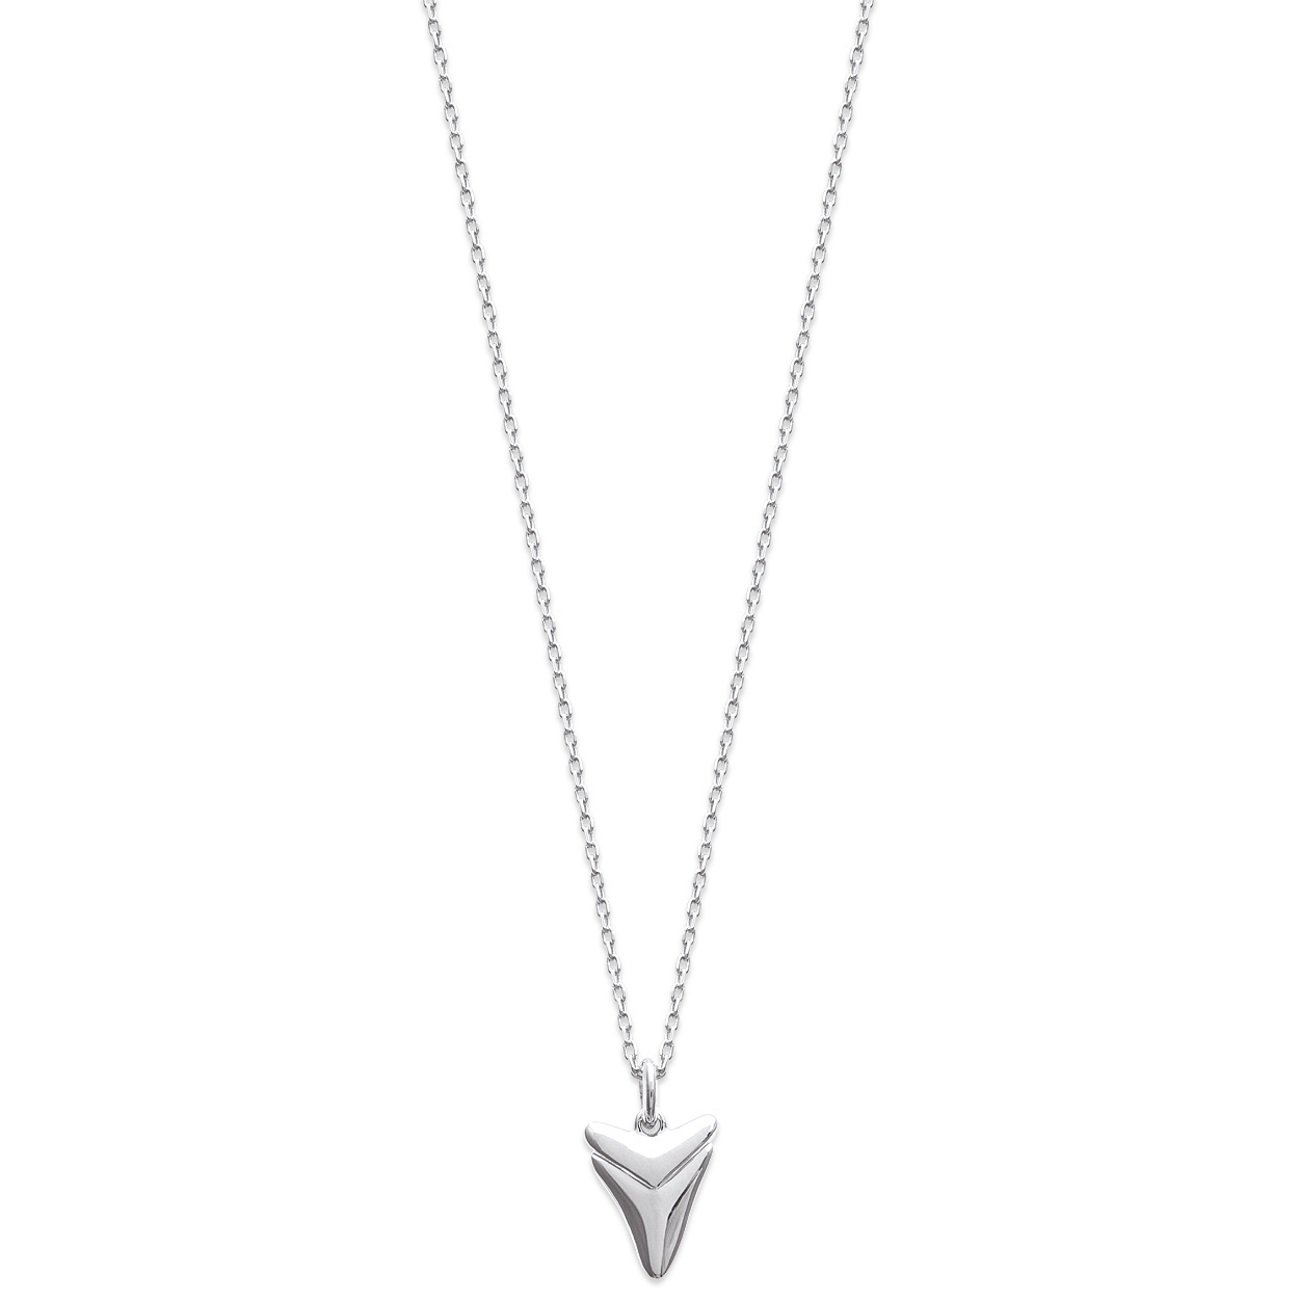 050d4af4561b Tata Gisèle collar collar collar arivaca en plata 925 000 Circona triángulo  – incluye bolsita regalo terciopelo 324f72